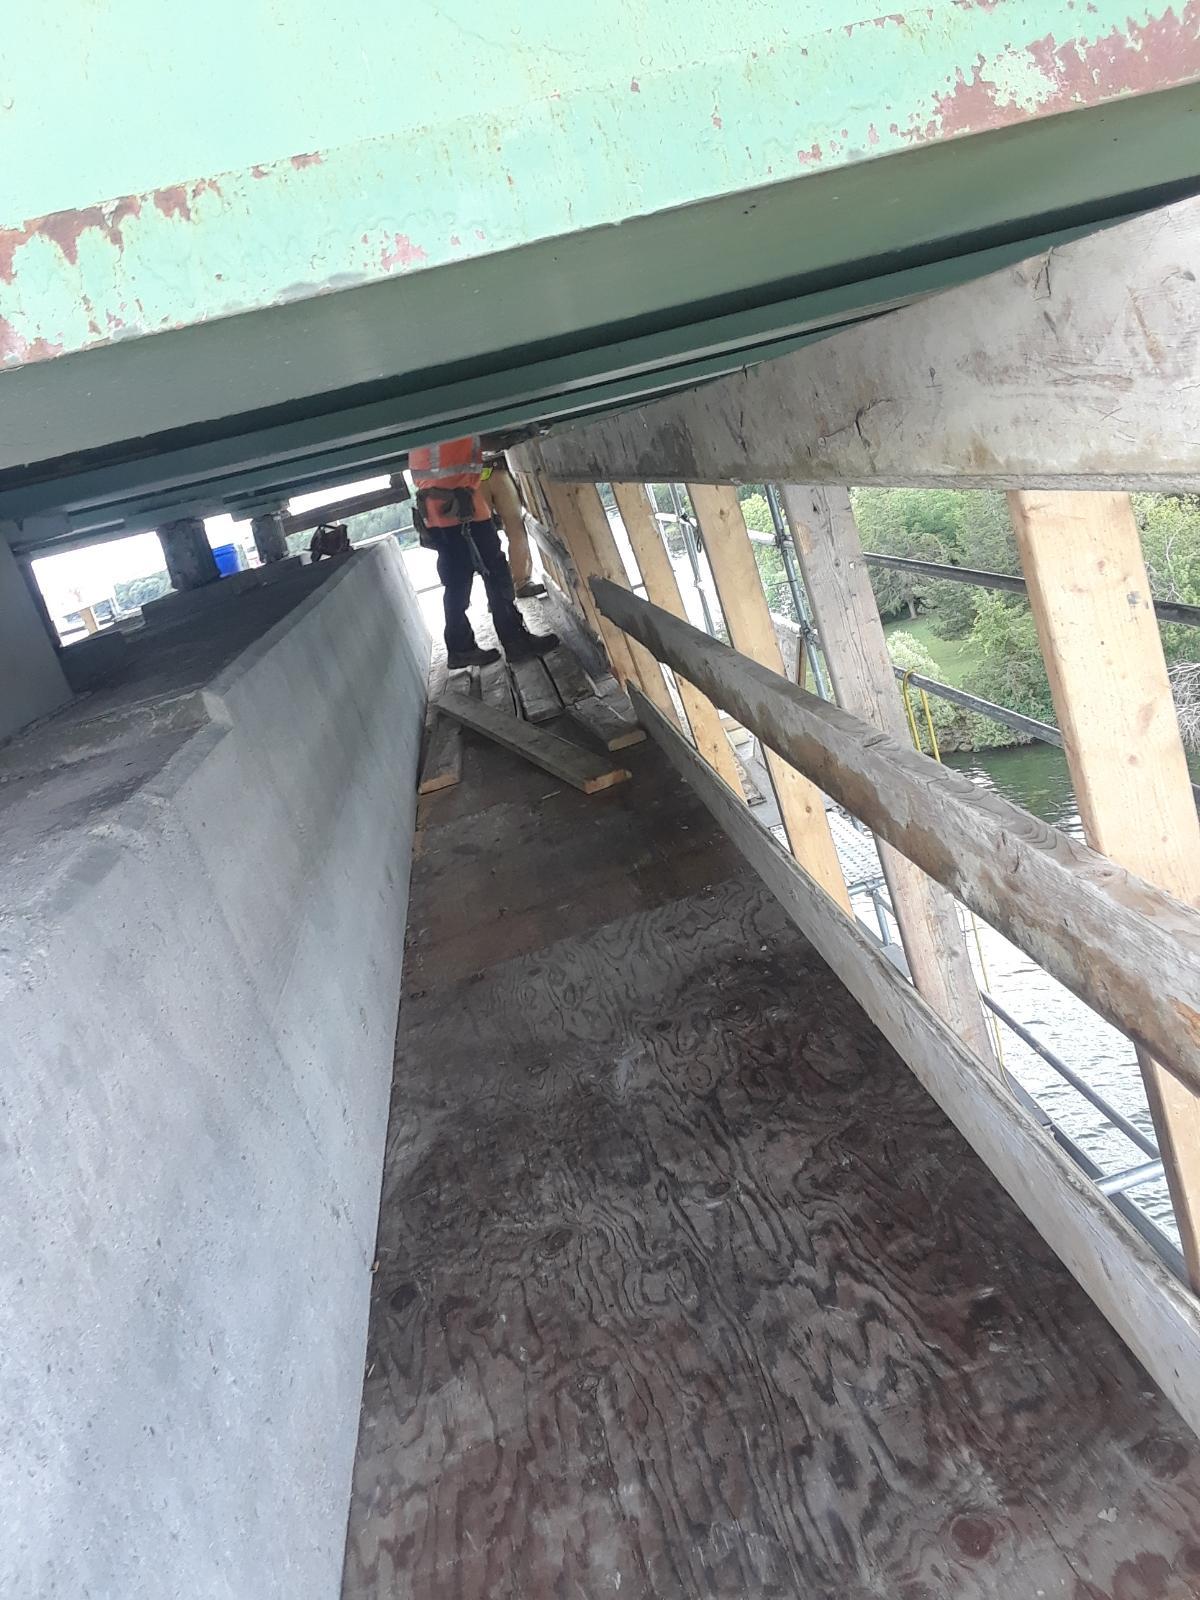 Pier cap 12, work platform build